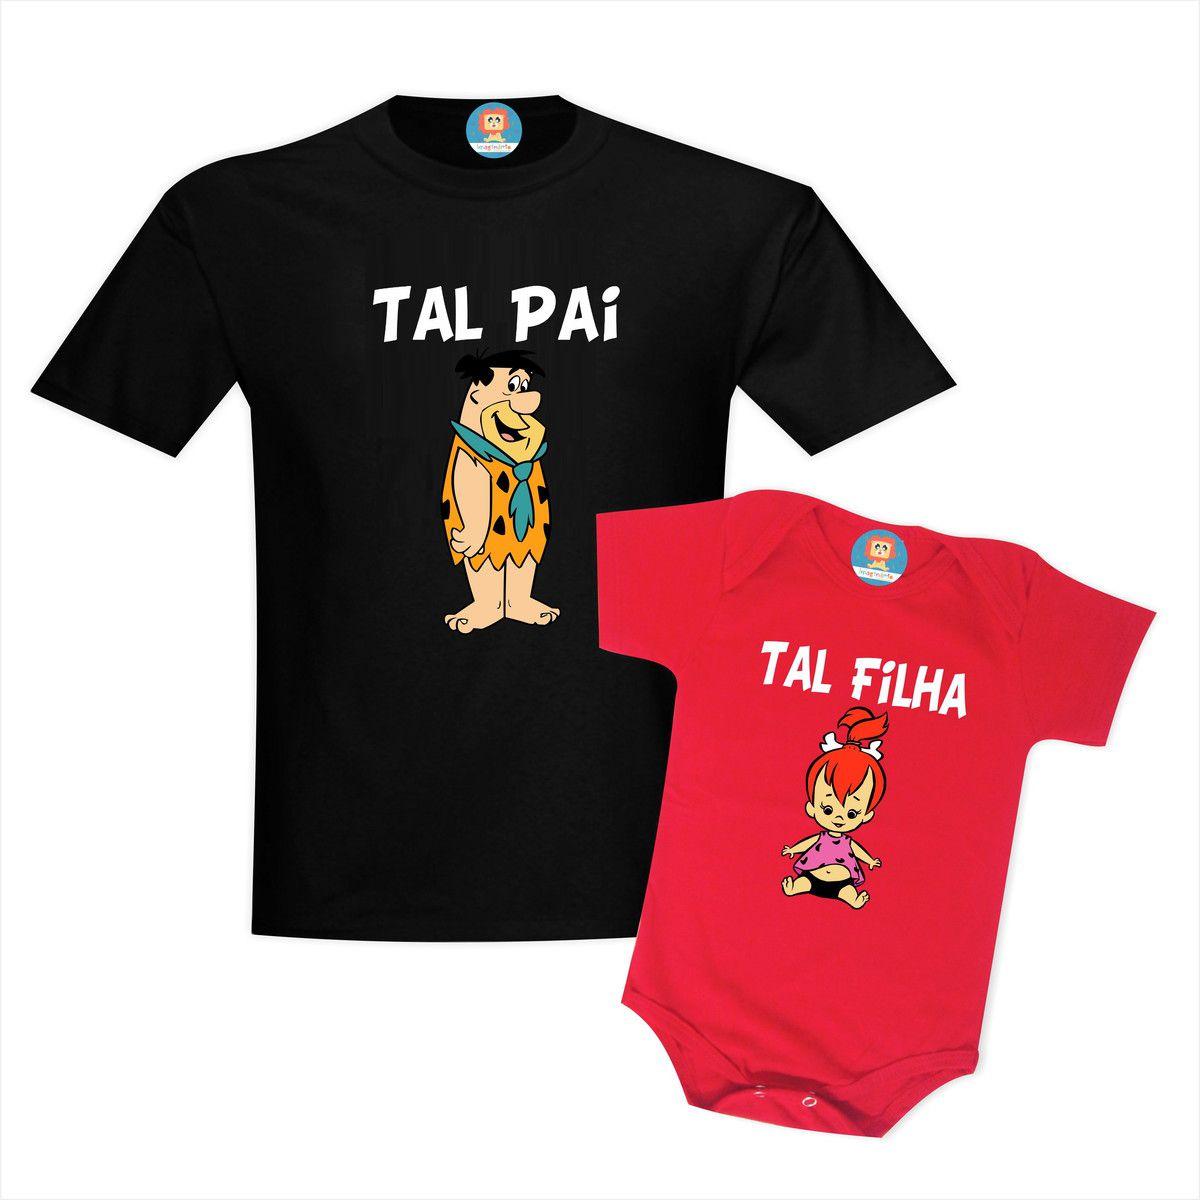 Kit Camiseta e Body Pai Fred Filha Pedrita Os Flinstones